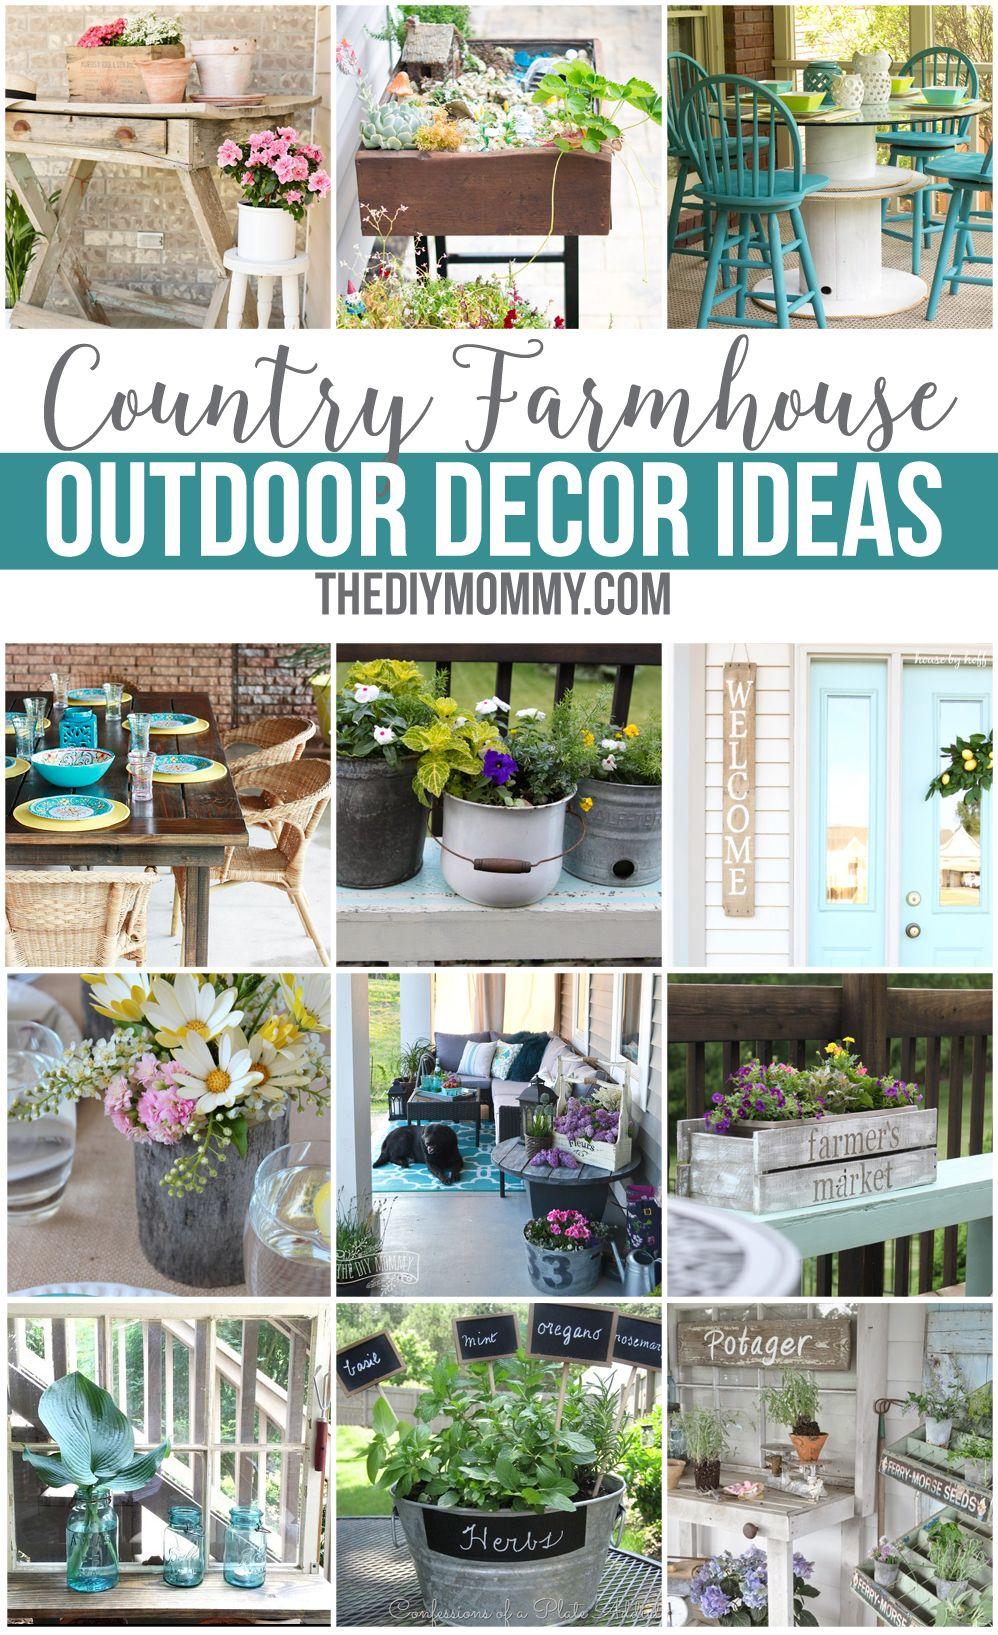 Gorgeous Country Farmhouse Outdoor Decor Ideas